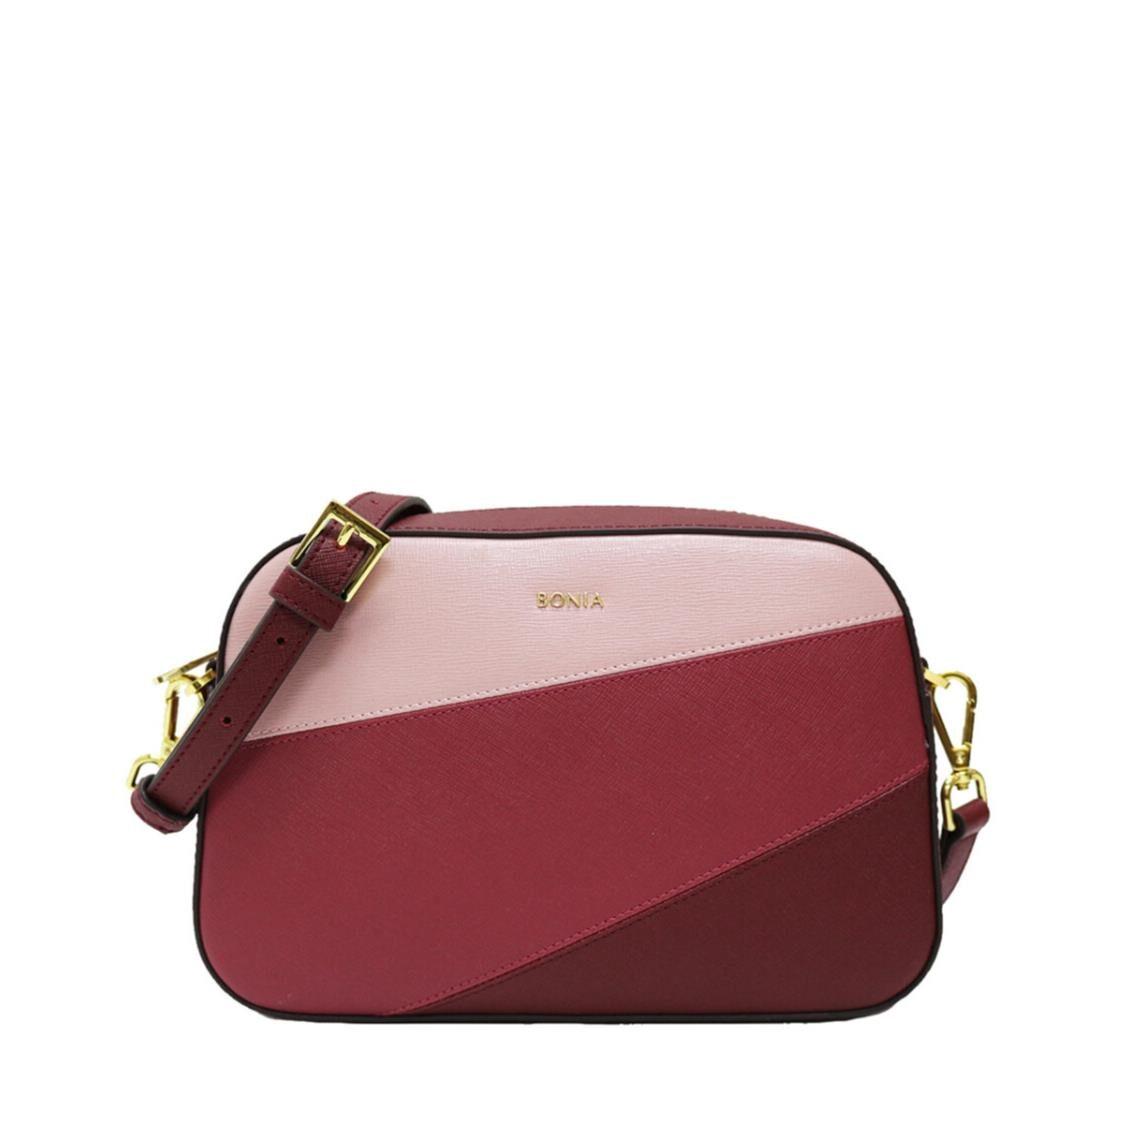 Bonia Crossbody Bag 801455-002-14